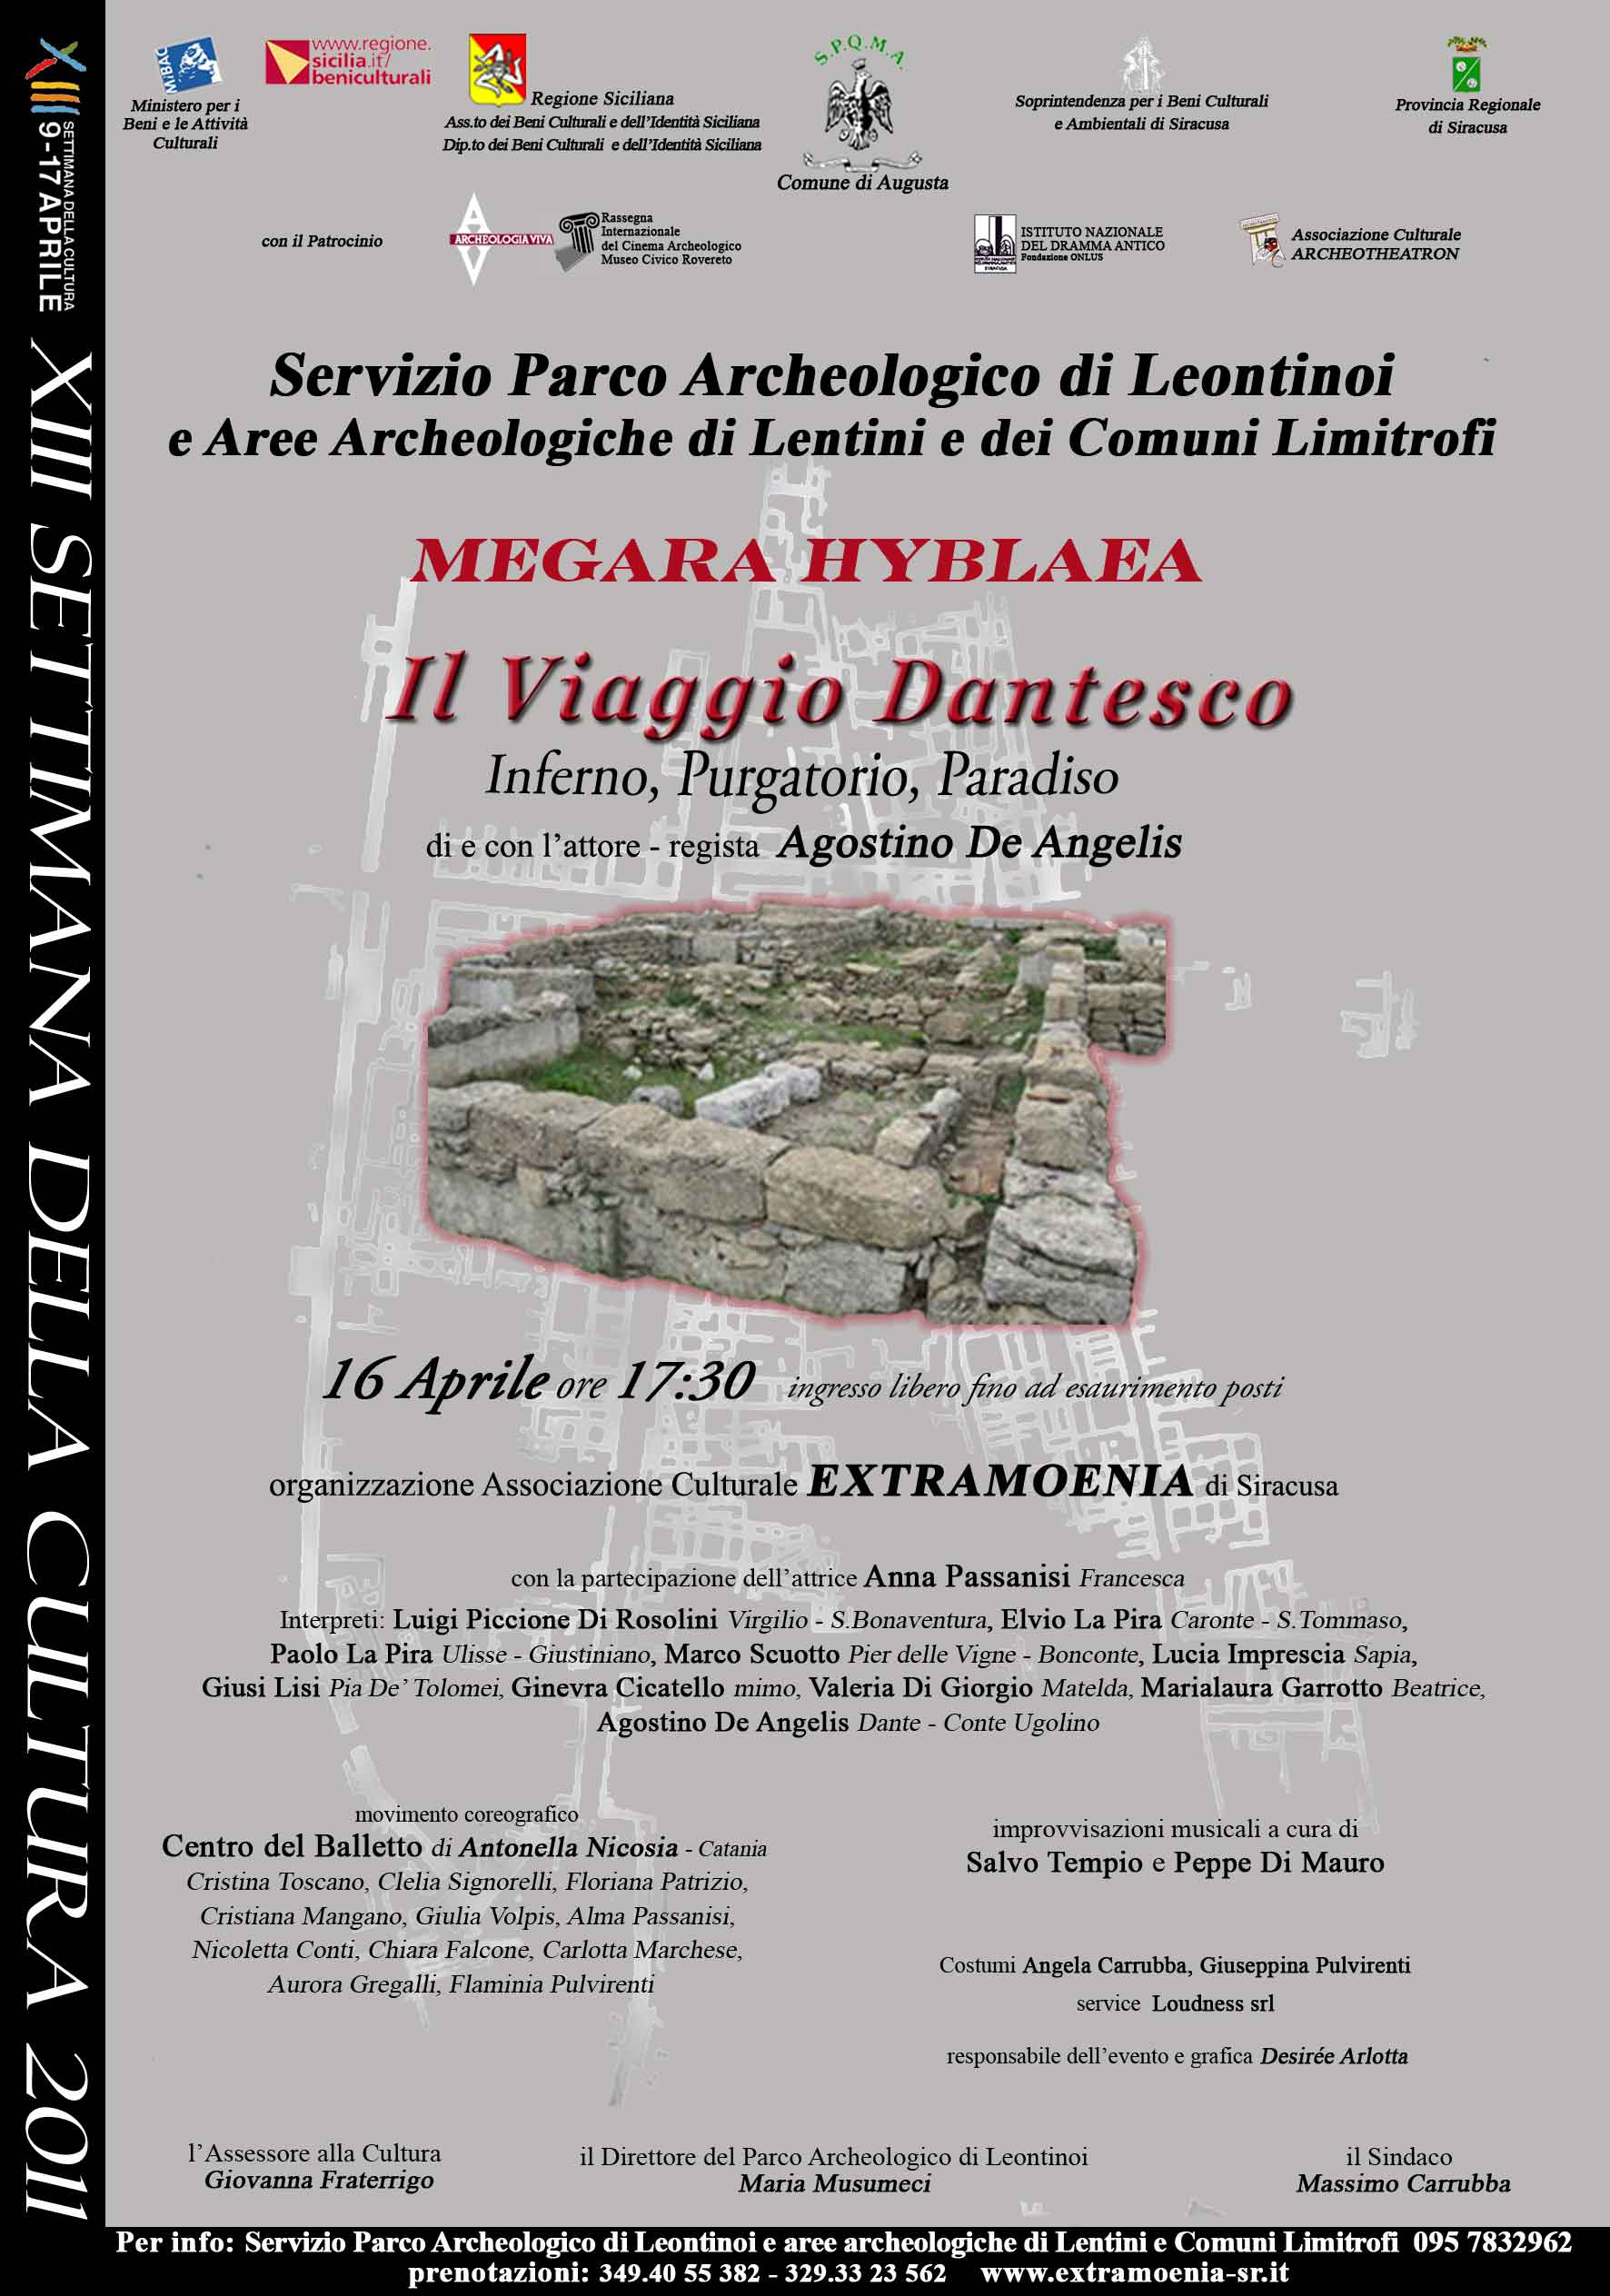 VIAGGIO DANTESCO AL PARCO ARCHEOLOGICO MEGARA HYBLAEA